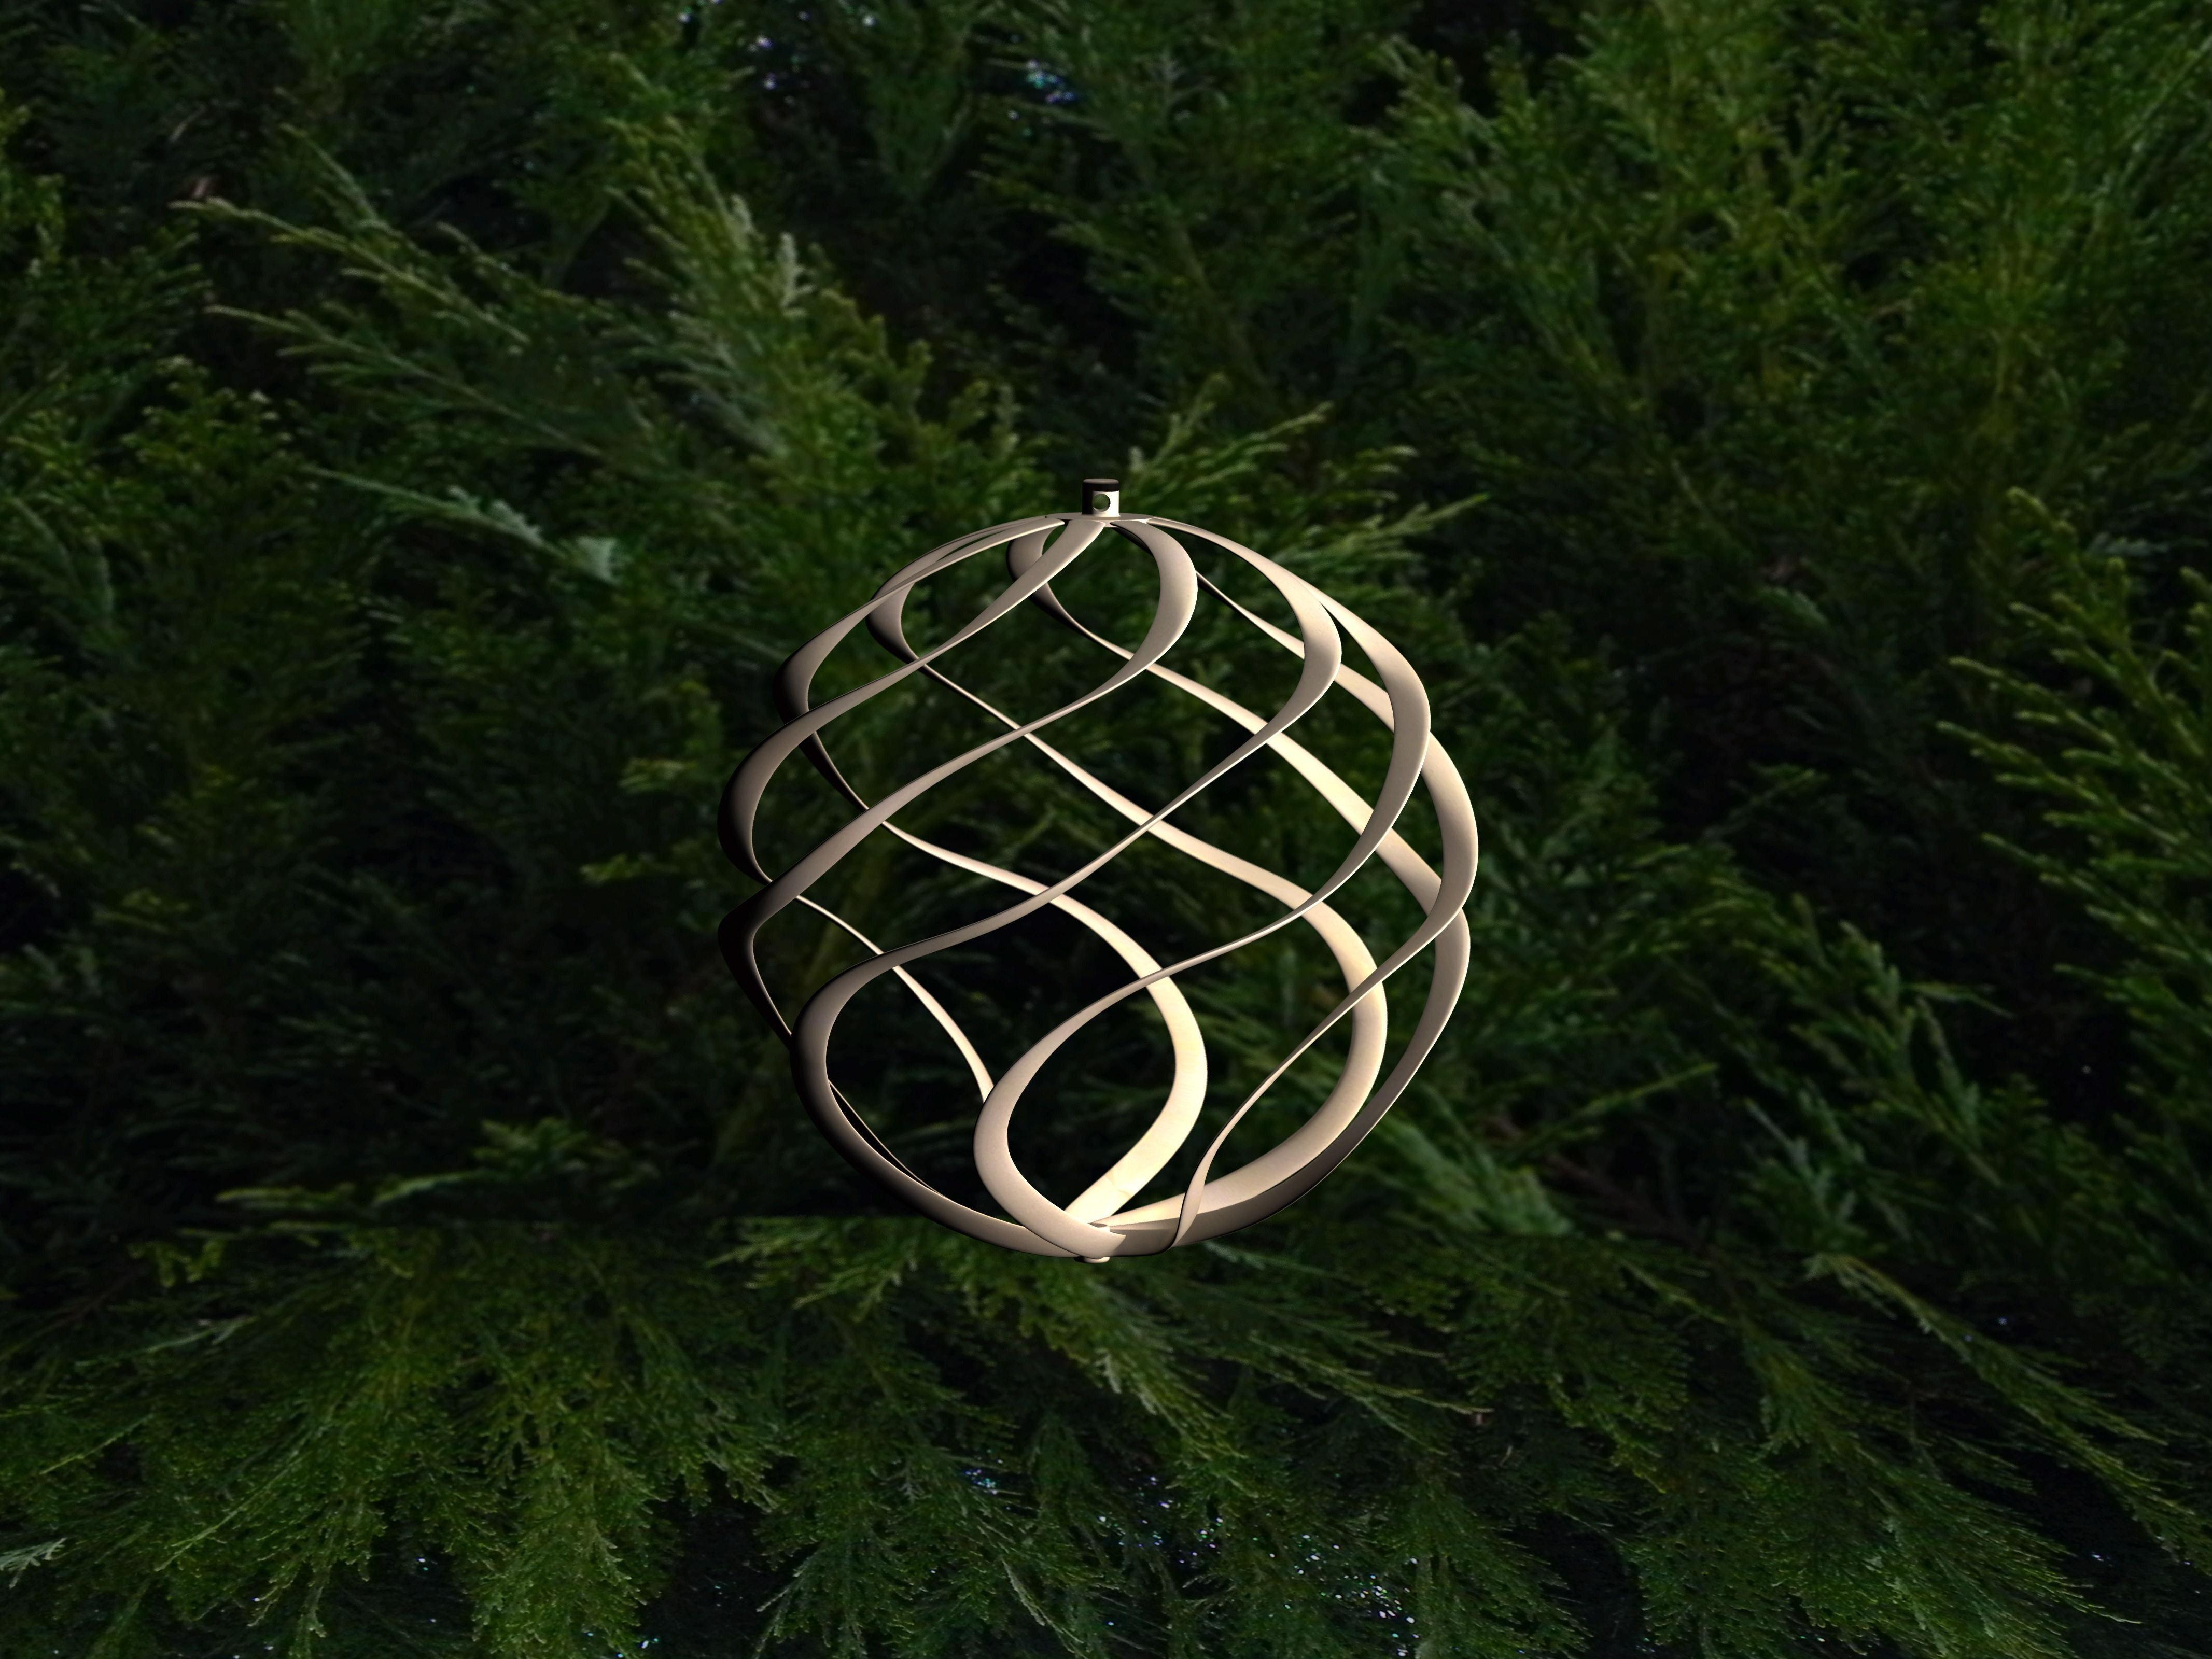 3d Printable Model Ornament For Christmas Tree